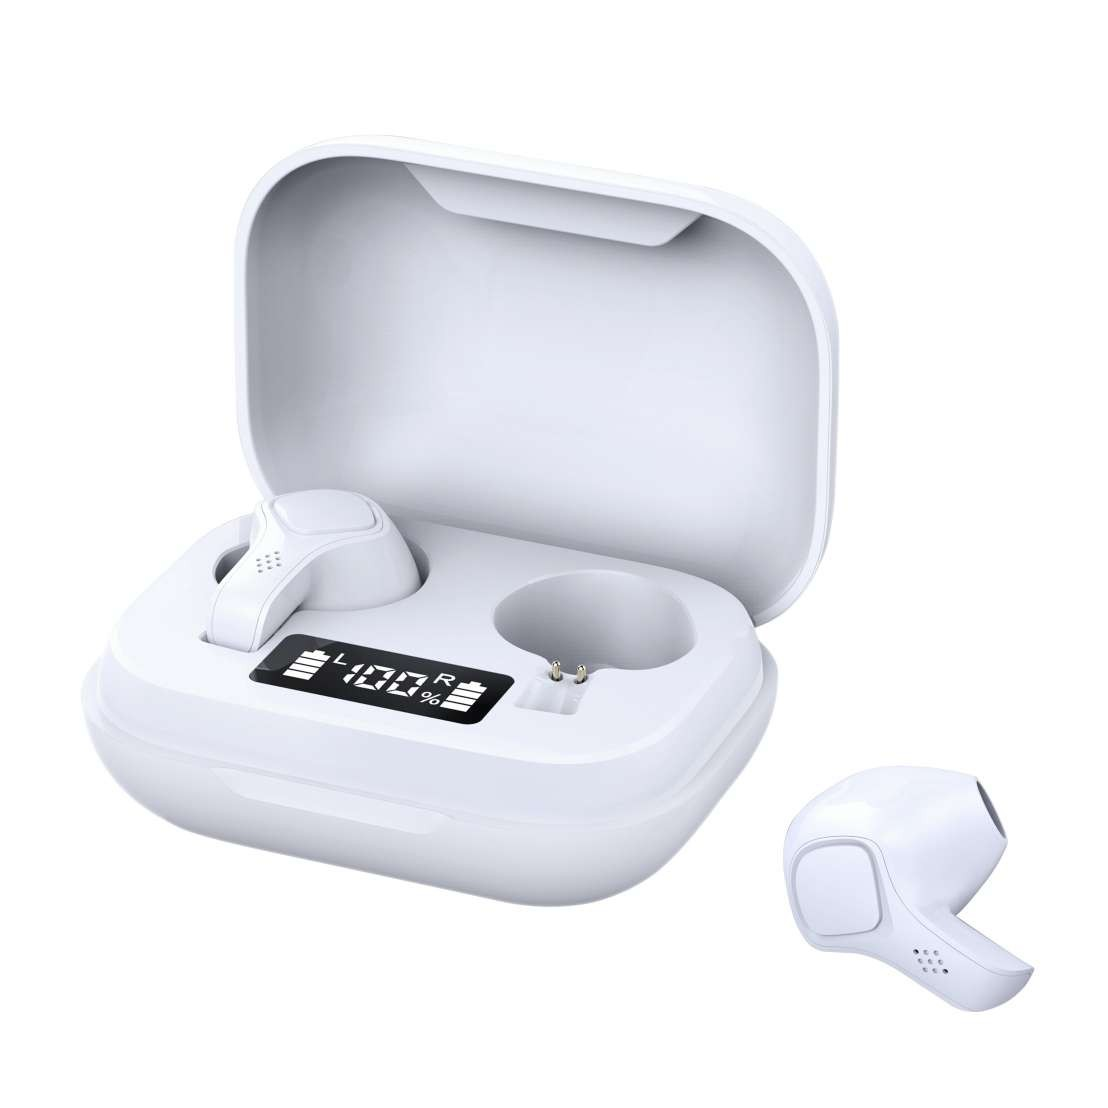 Casti Smart Techstar® TWS S20 , Wireless, Bluetooth V5.0, HD Audio, Touch, IPX5, iOS, Android, 300mAh, Type-C, Alb